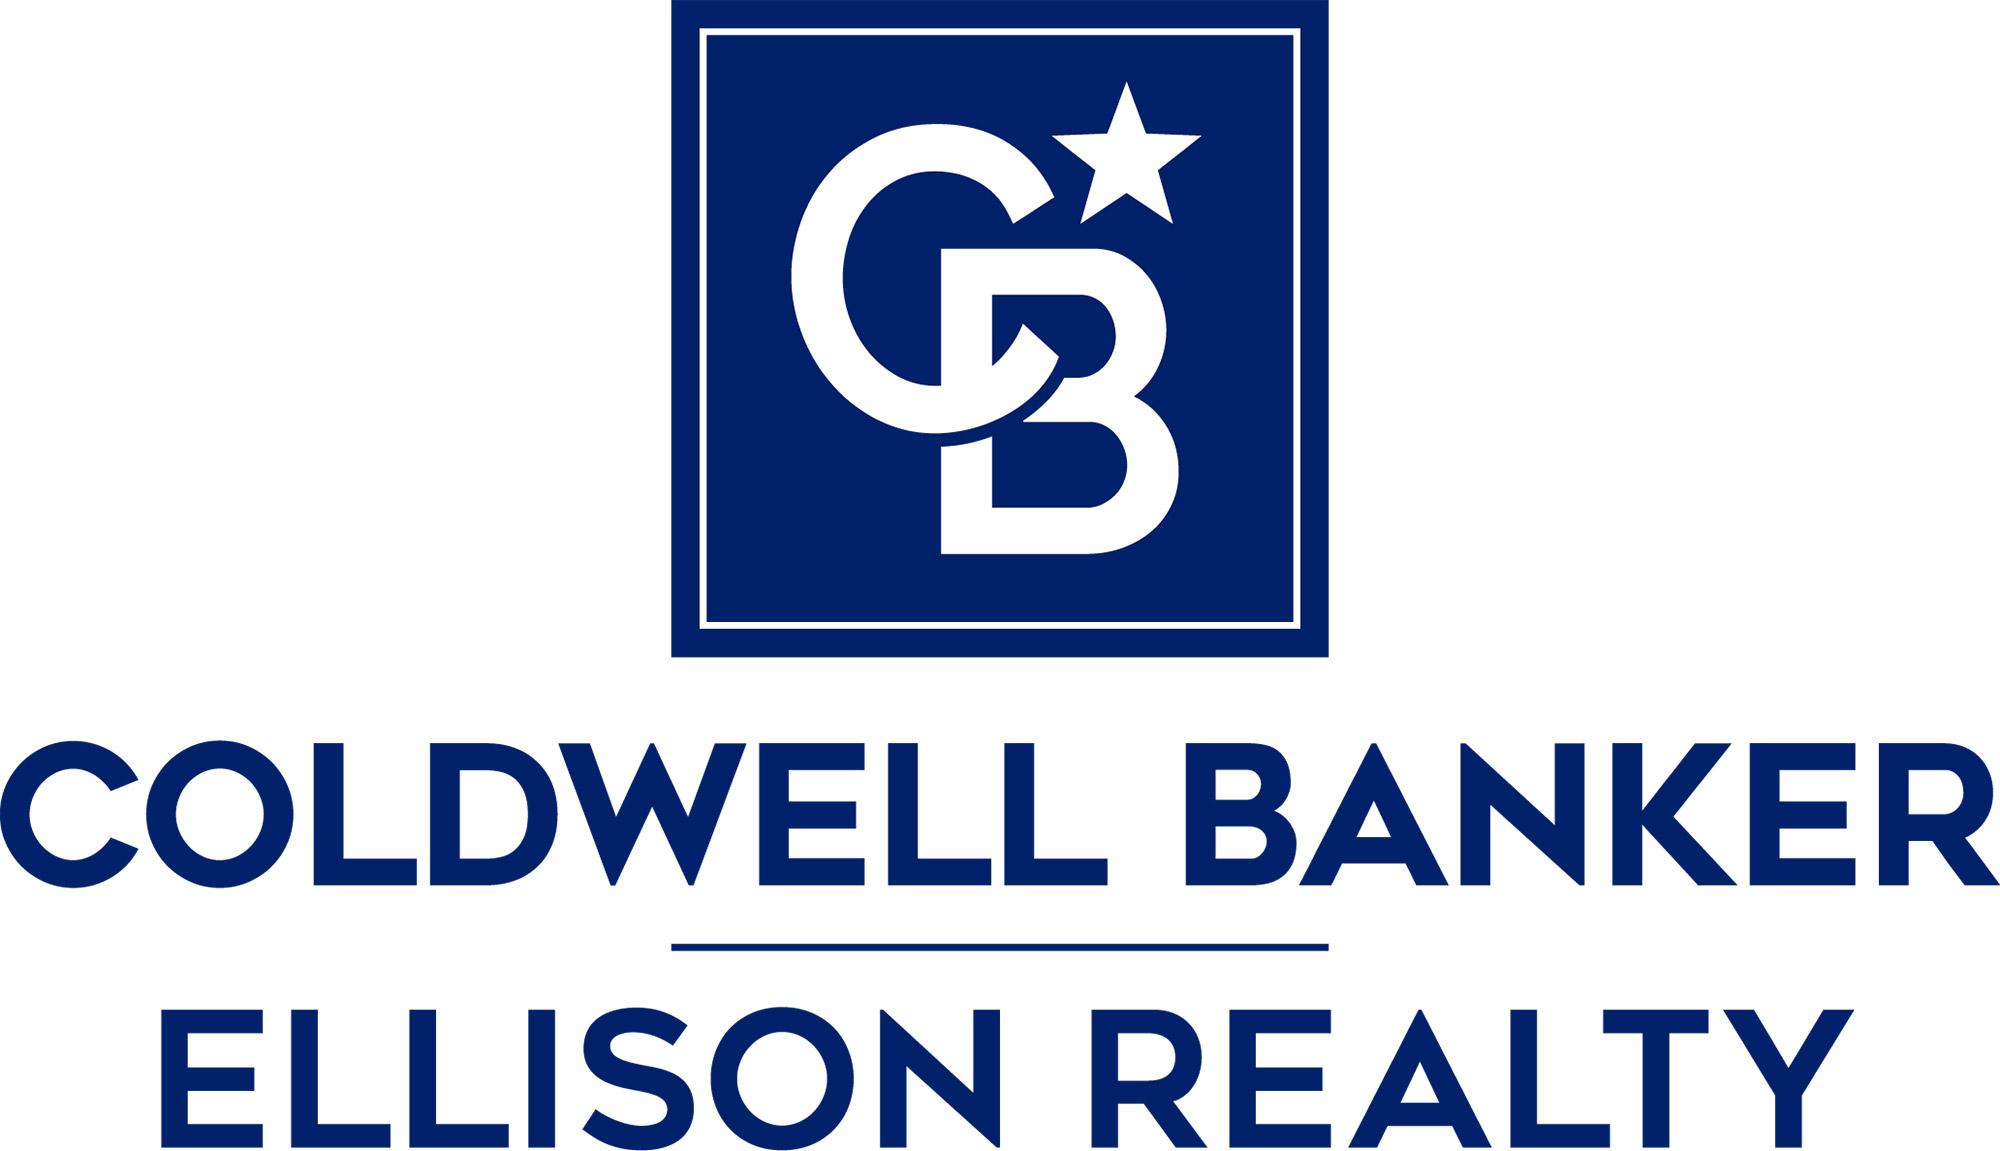 Jae Ann Witzgall, LLC - Coldwell Banker Ellison Realty Logo